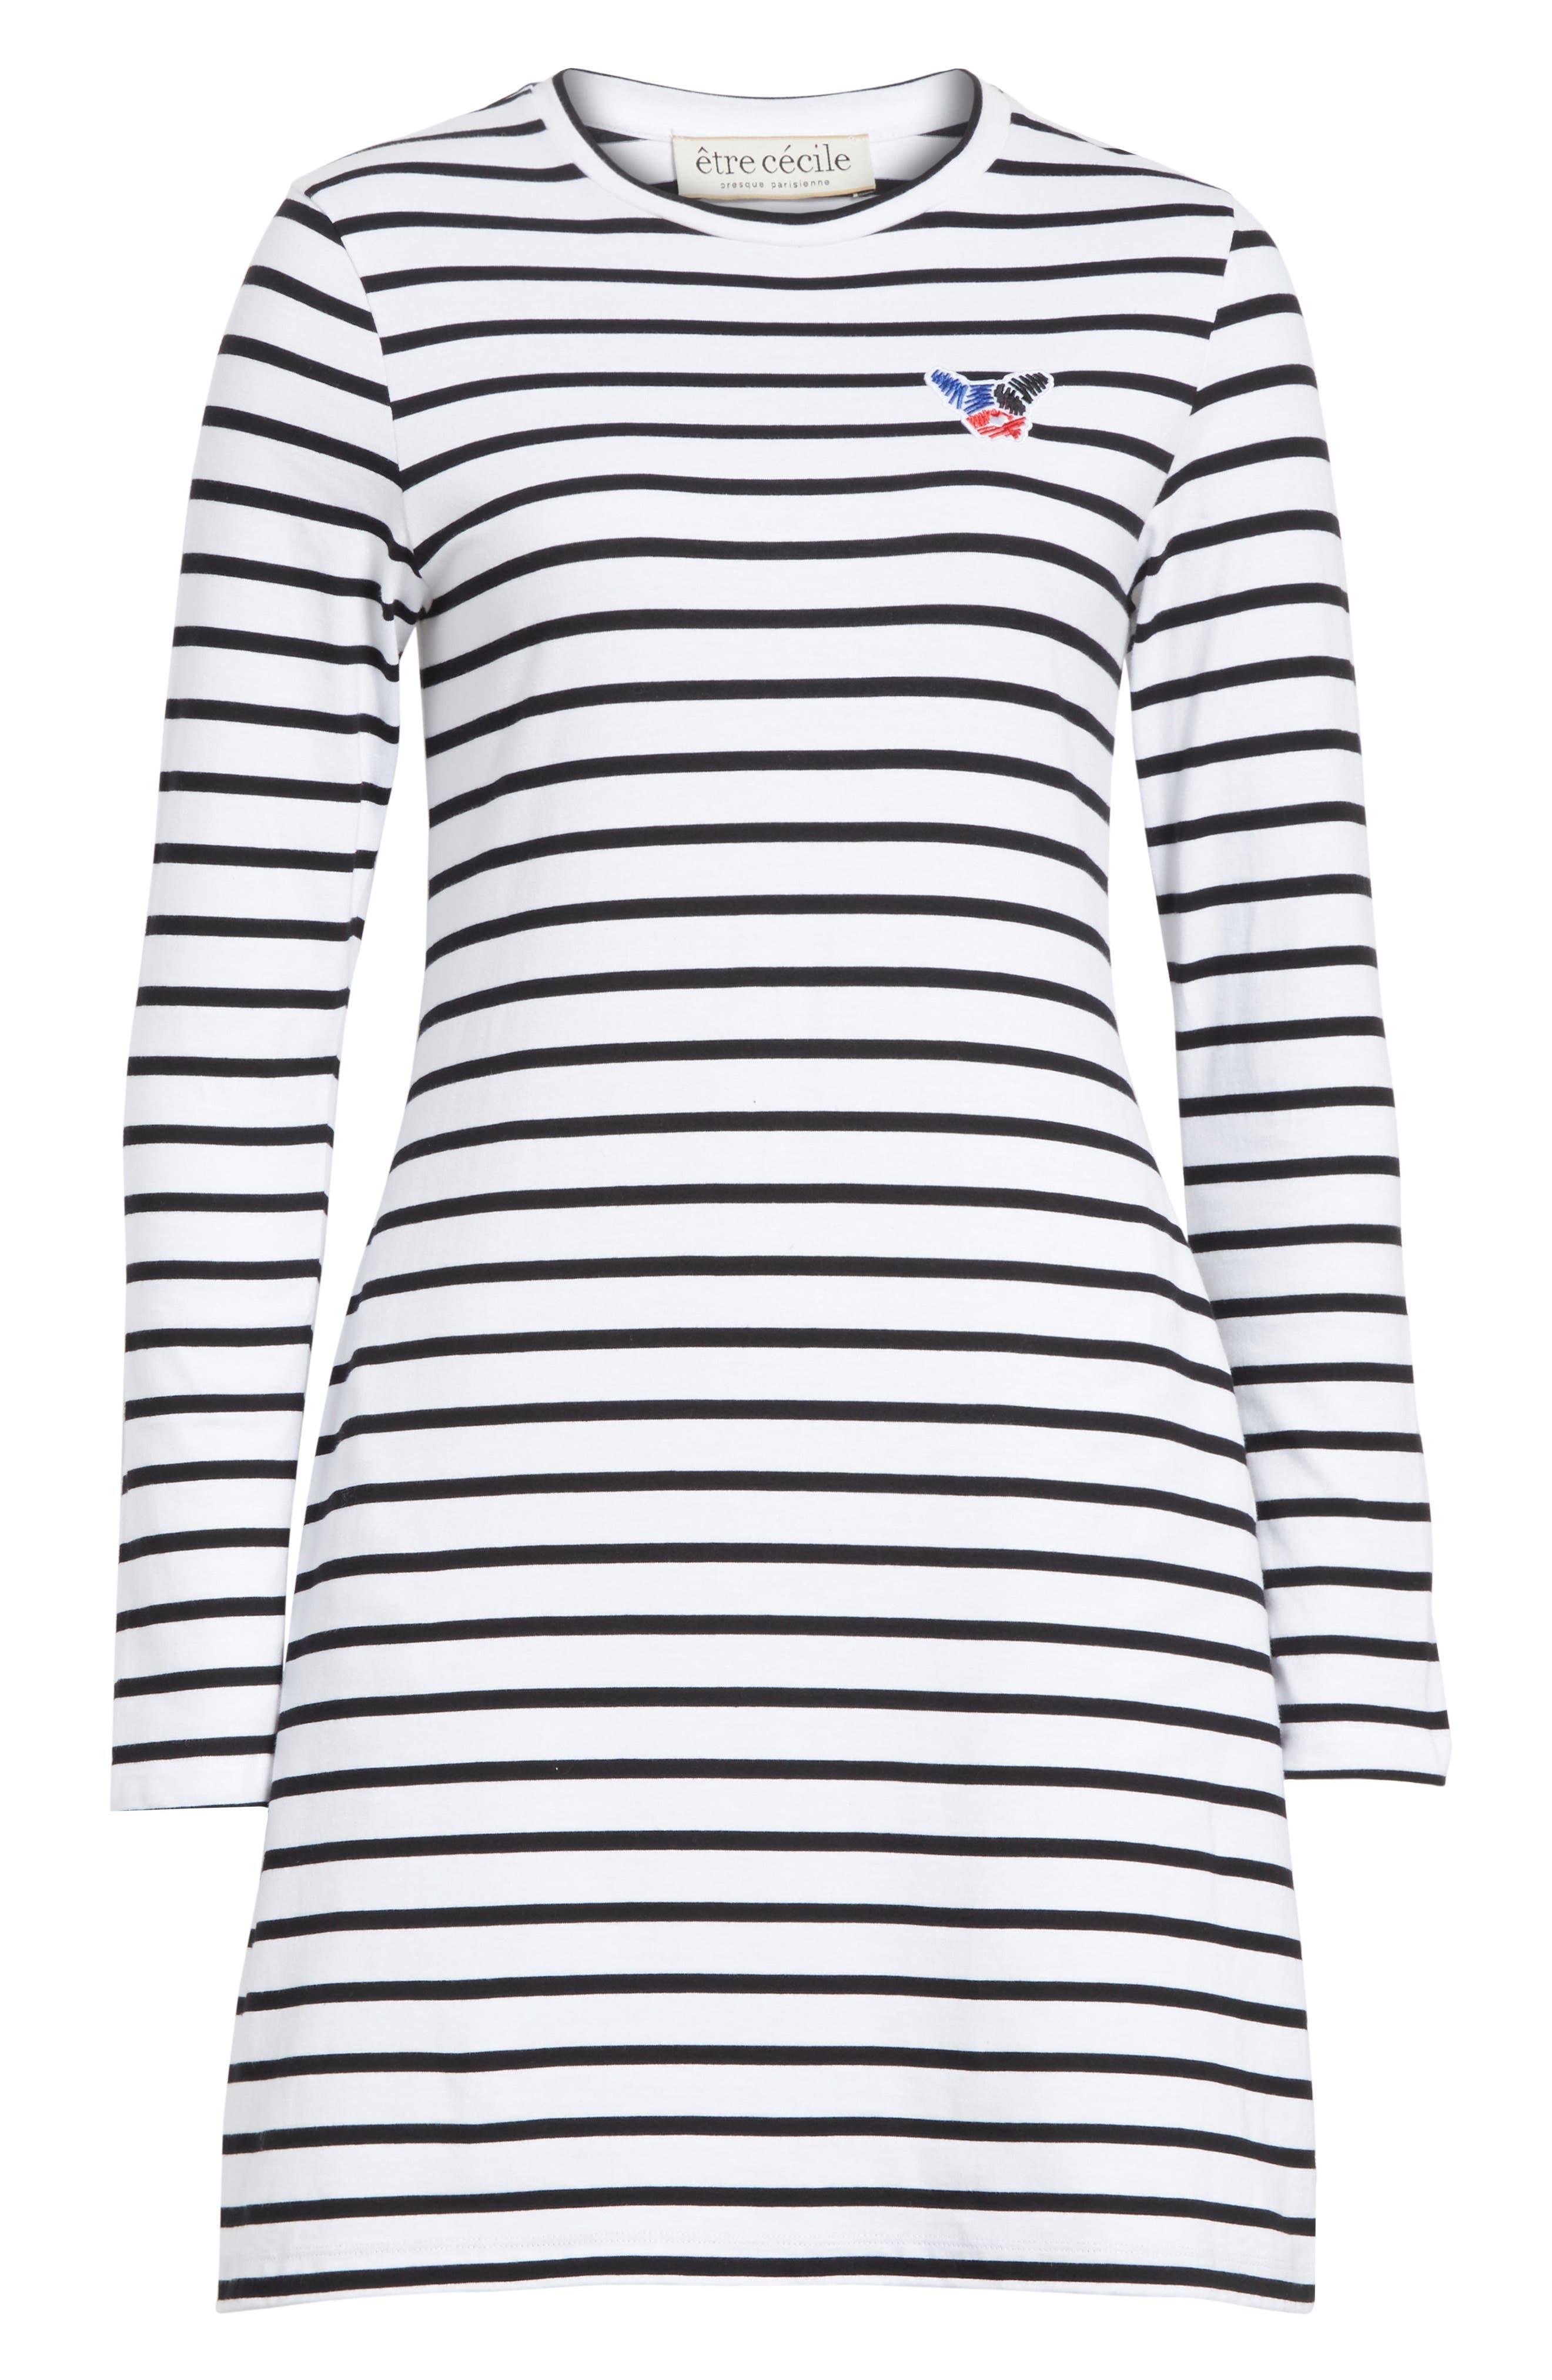 être cécile Scribble Dog Stripe T-Shirt Dress,                             Alternate thumbnail 7, color,                             Black Breton Stripe